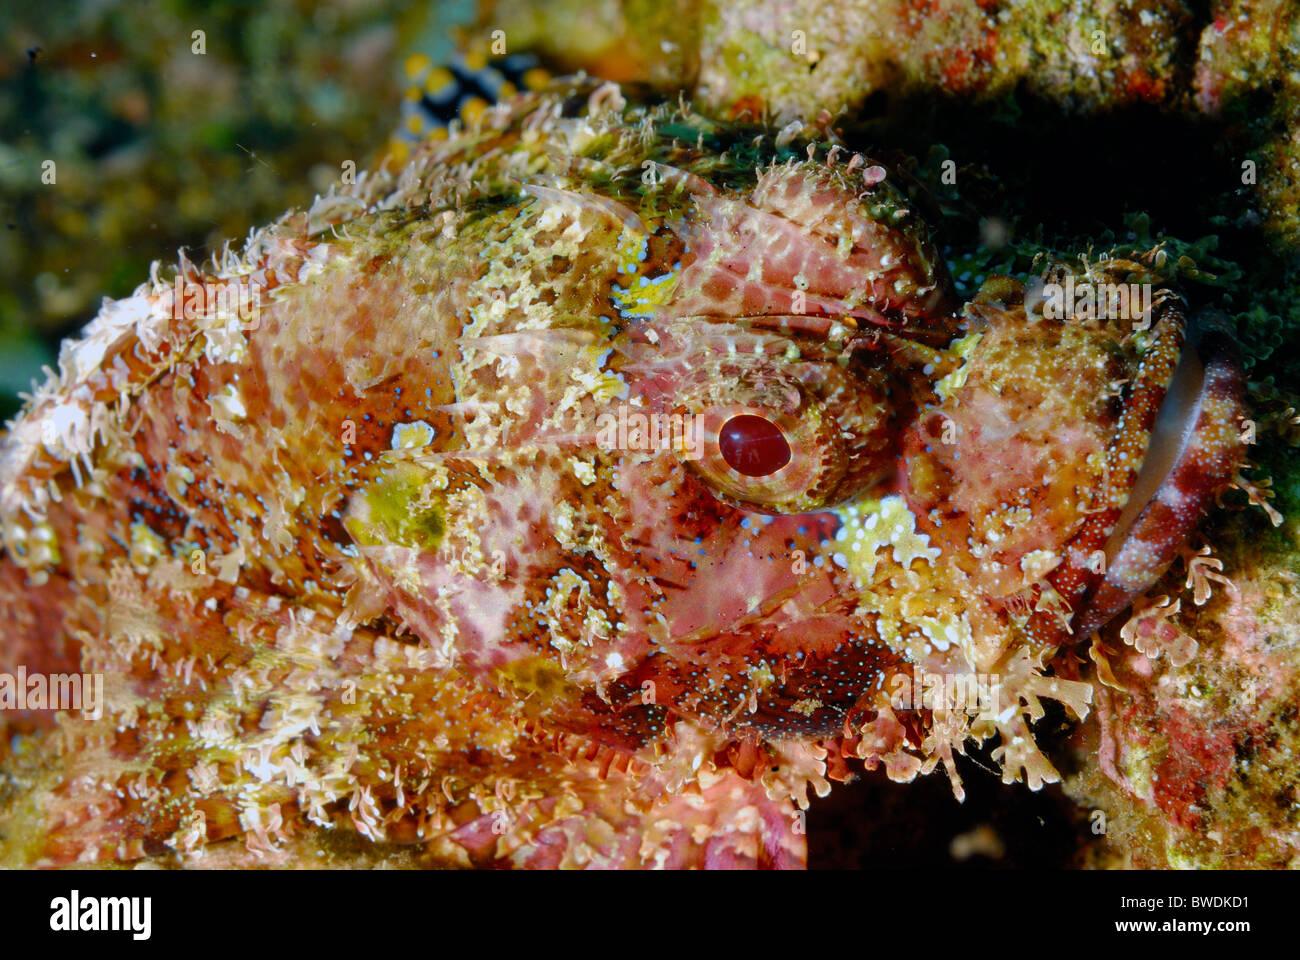 Testa piatta Scorpion Fish Scorpaenopsis oxycephalus, Tulamben, Bali, Indonesia Asia Immagini Stock